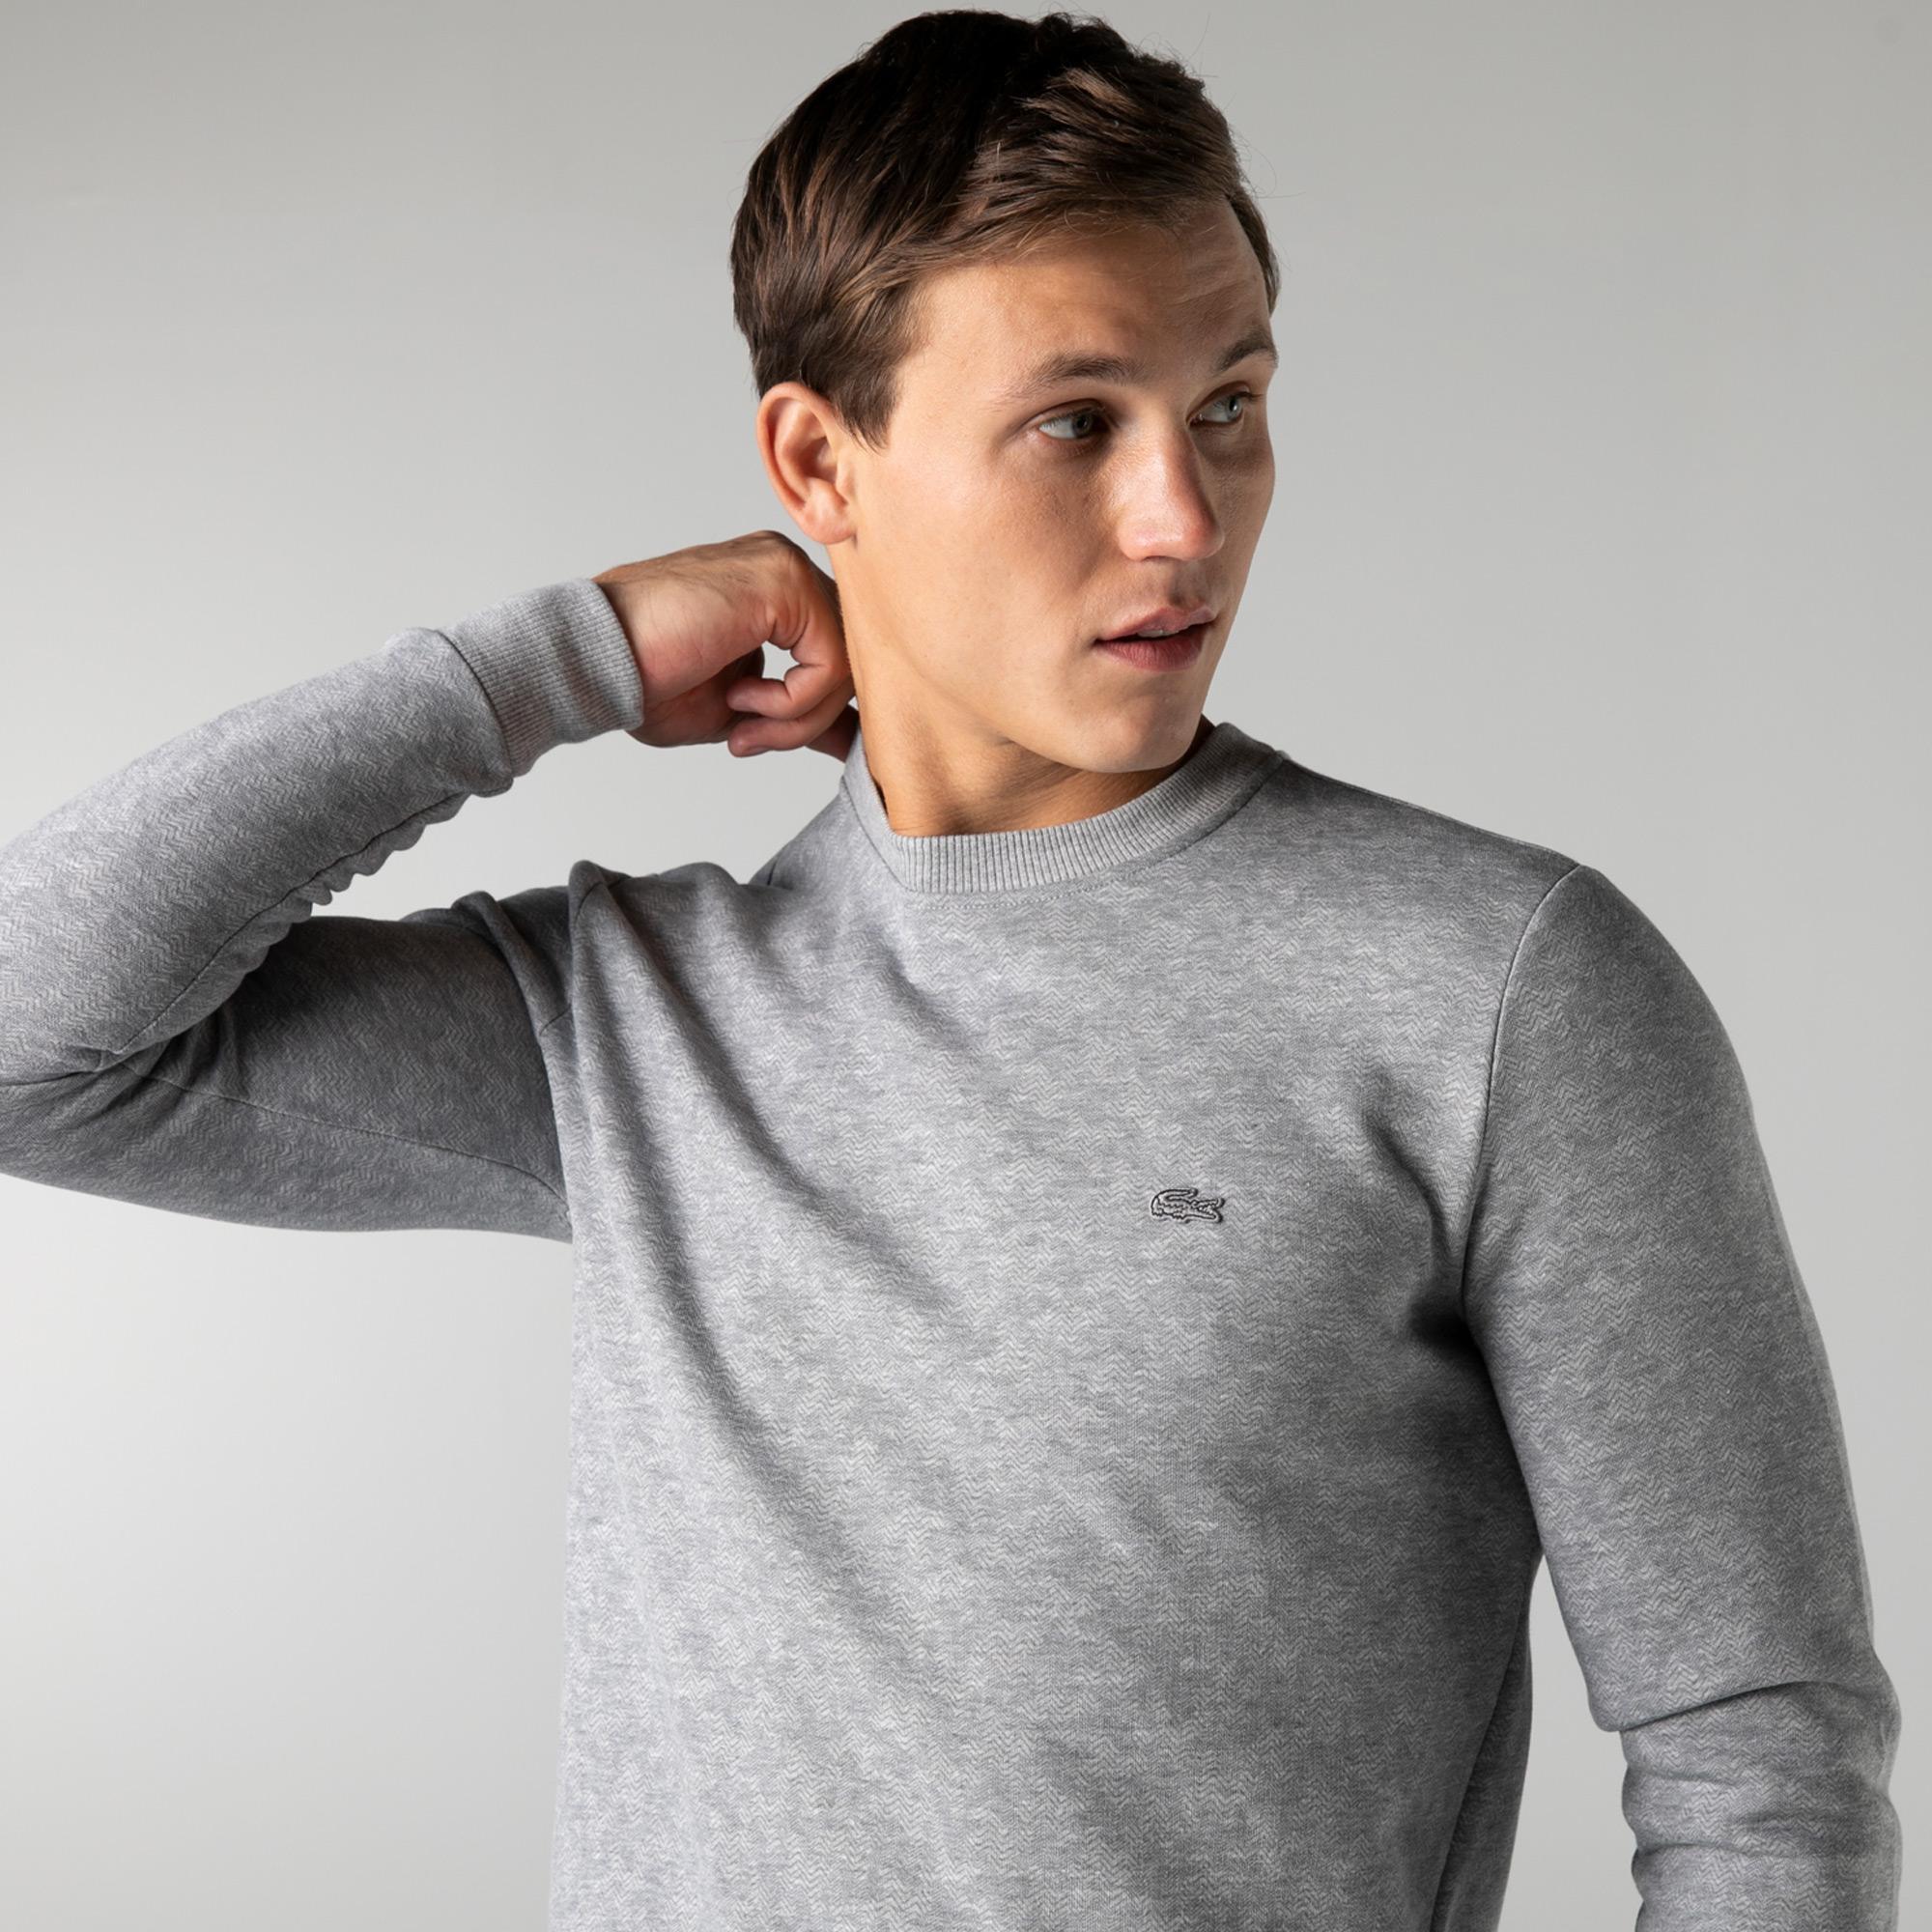 Lacoste Erkek Slim Fit Bisiklet Yaka Desenli Gri Sweatshirt